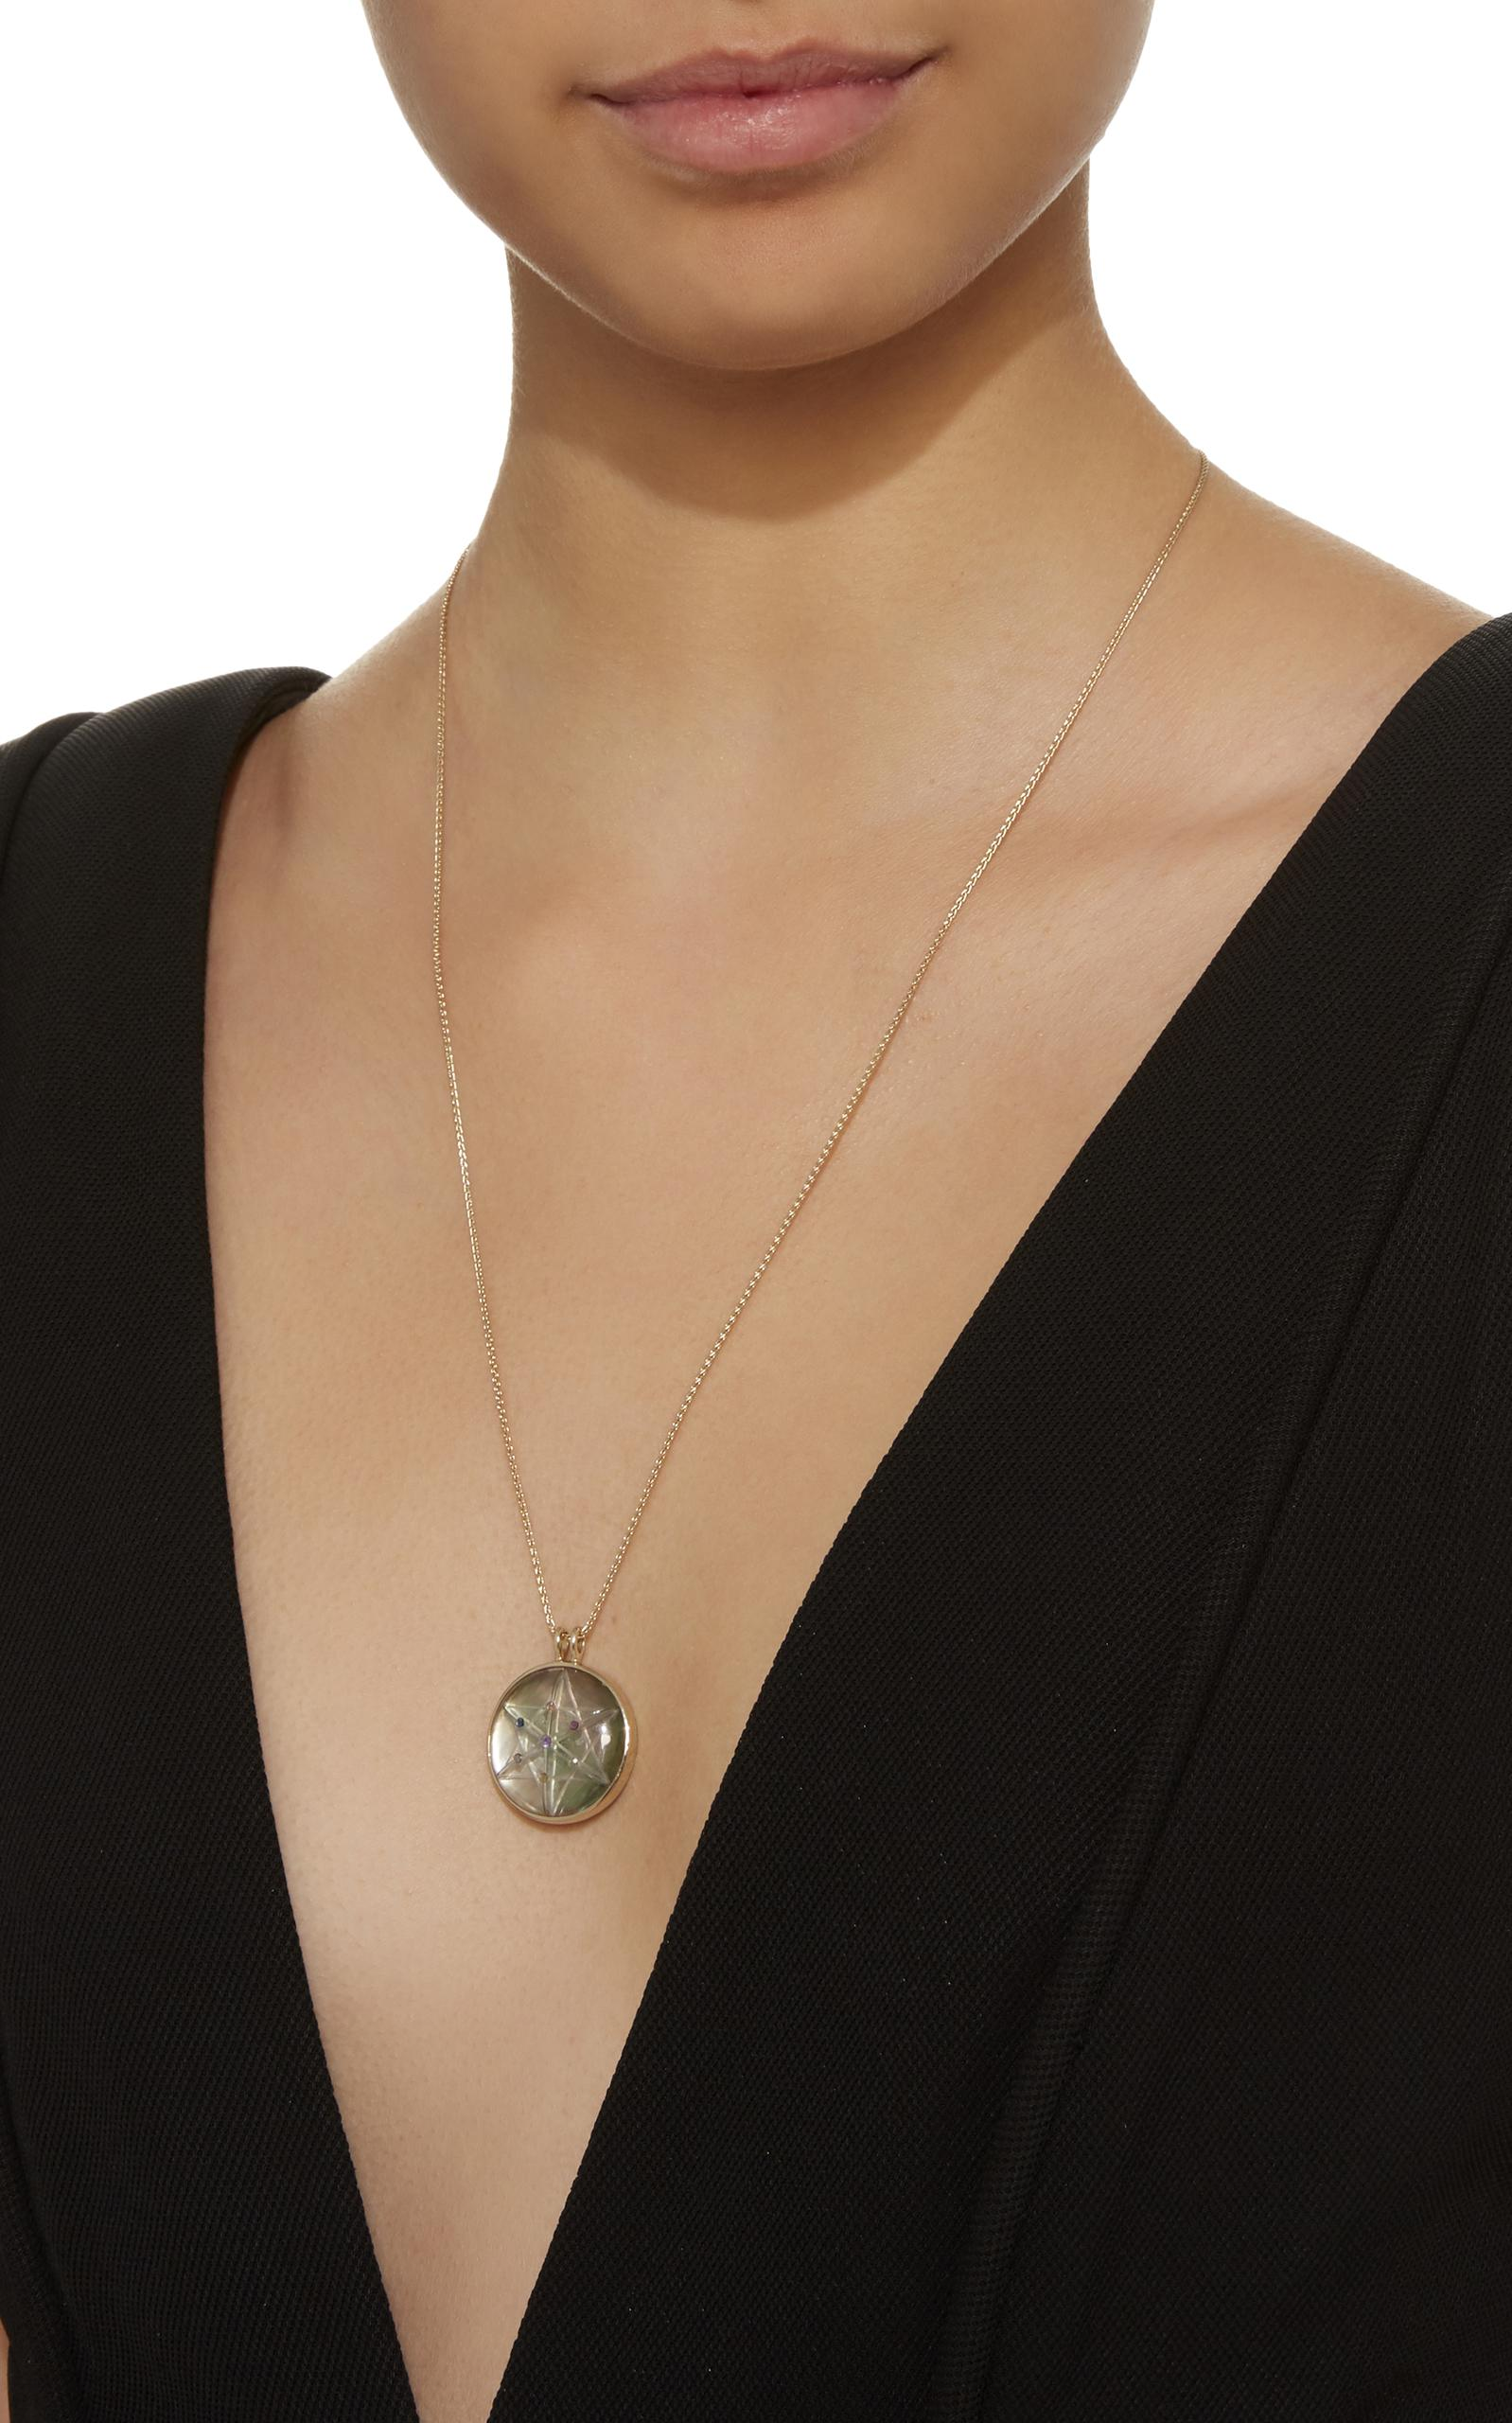 Noor Fares Carved Rock Crystal Pendant Necklace in Metallic